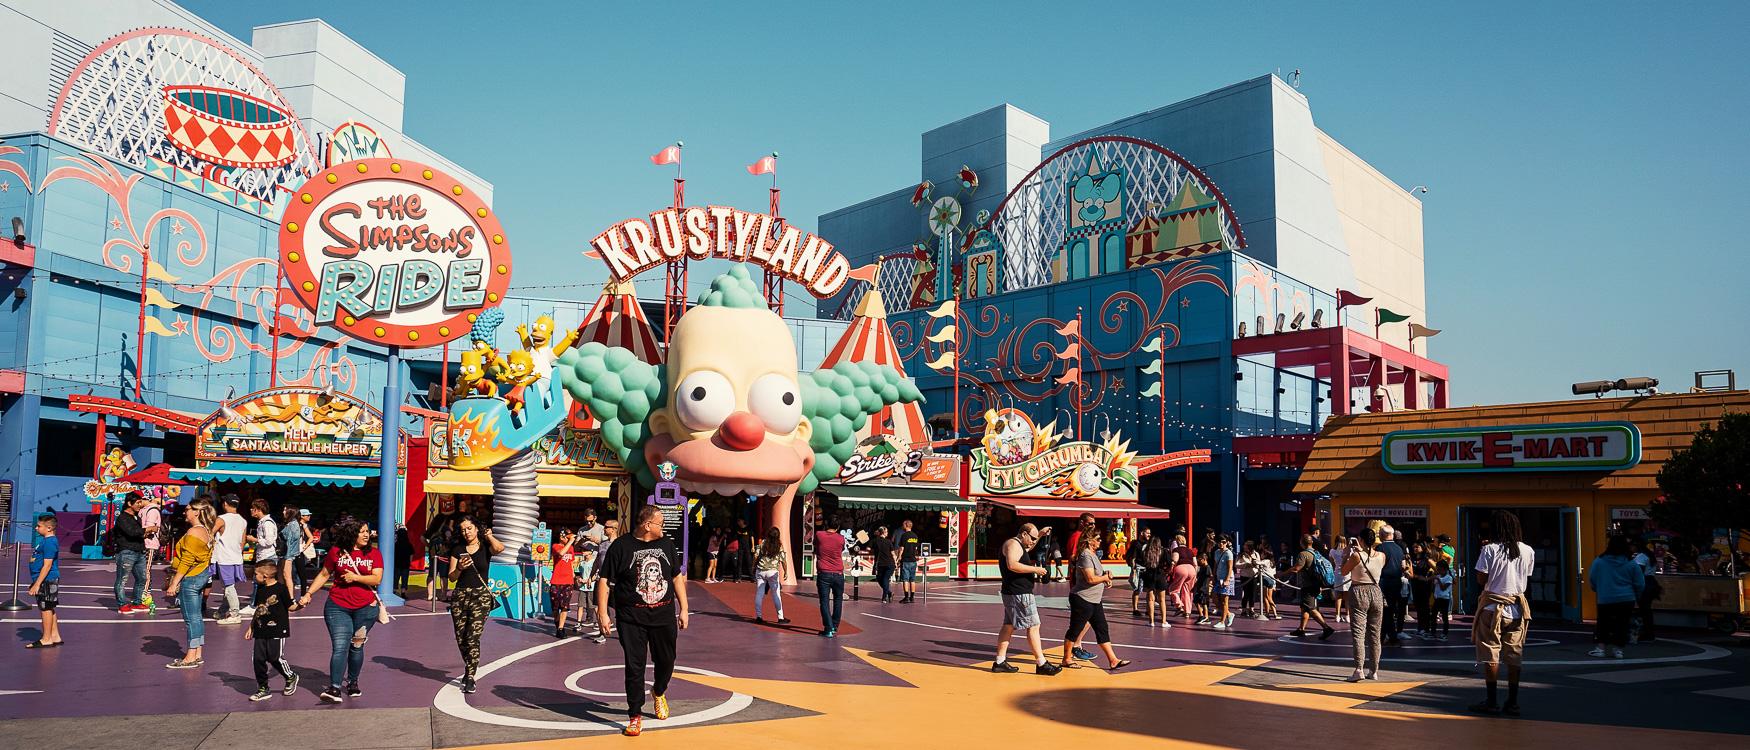 Krustyland, The Simpsons Ride Universal Studios Hollywood, LA